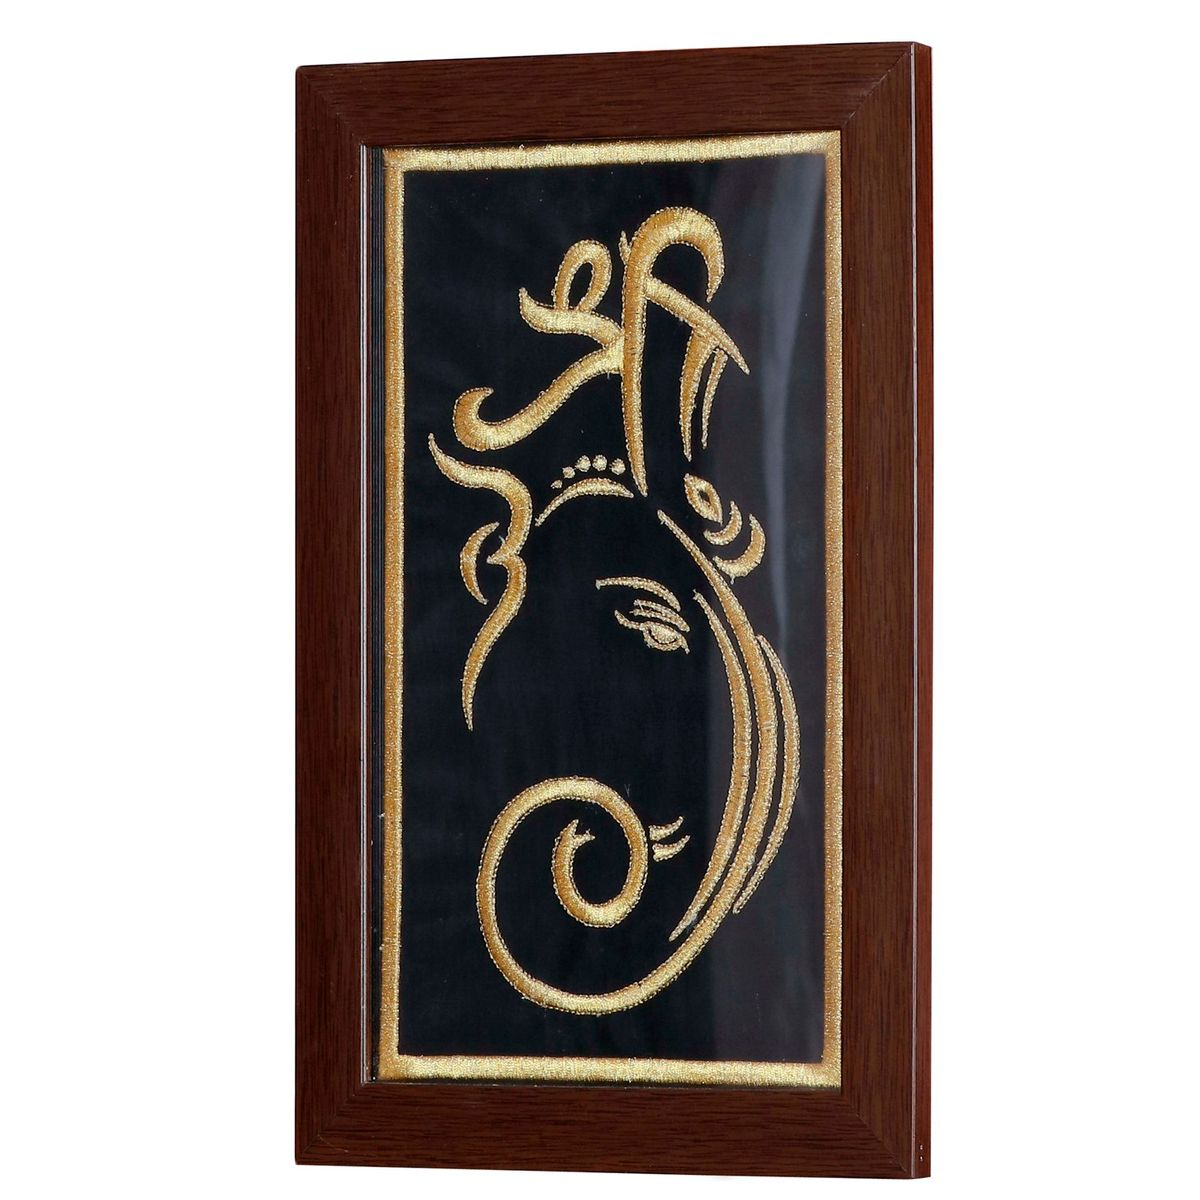 P K Ganesha Art Wall Hangings Frame Embroidered - Gold